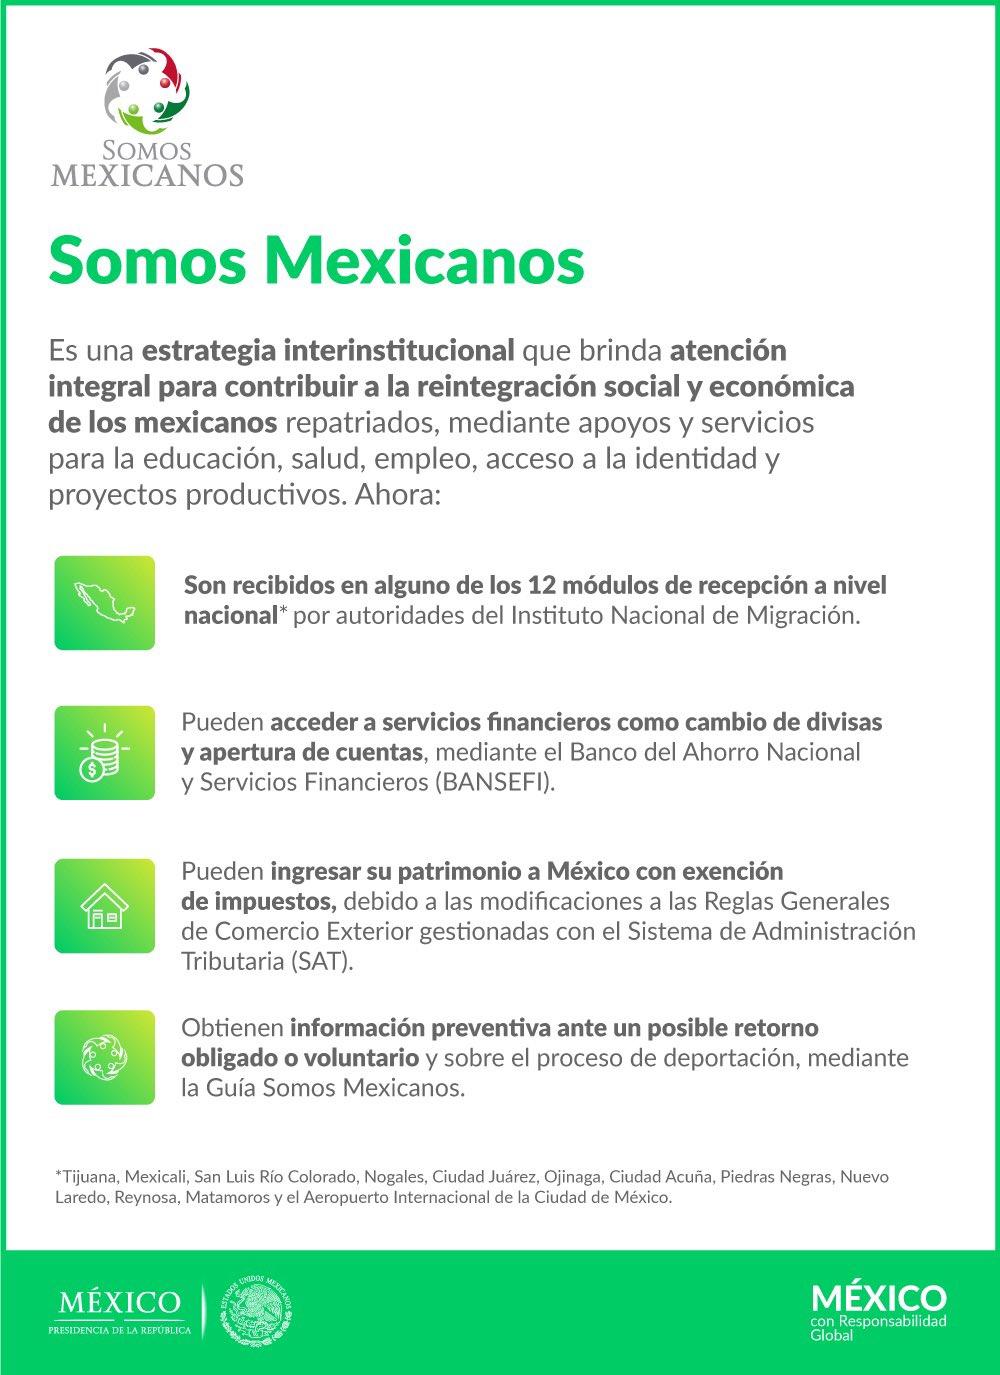 Hacienda On Twitter Si Regresas A México La Shcp A